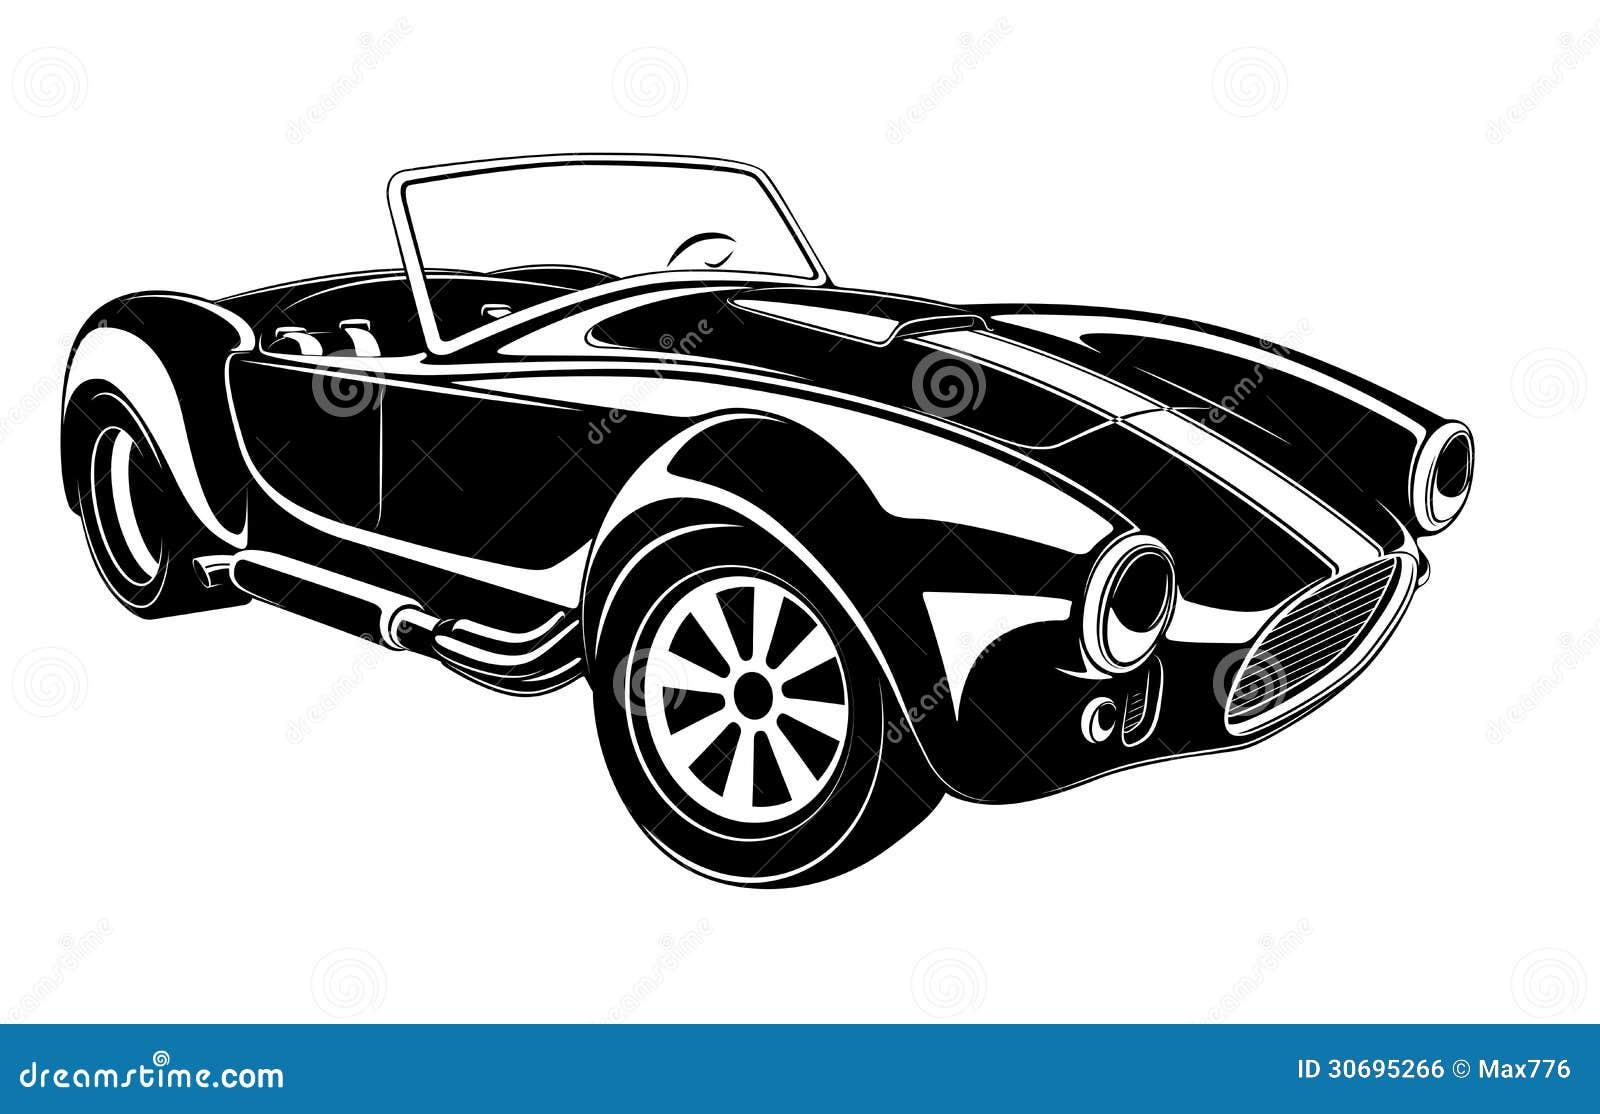 Retro Car Vector Royalty Free Stock Image Image 30695266